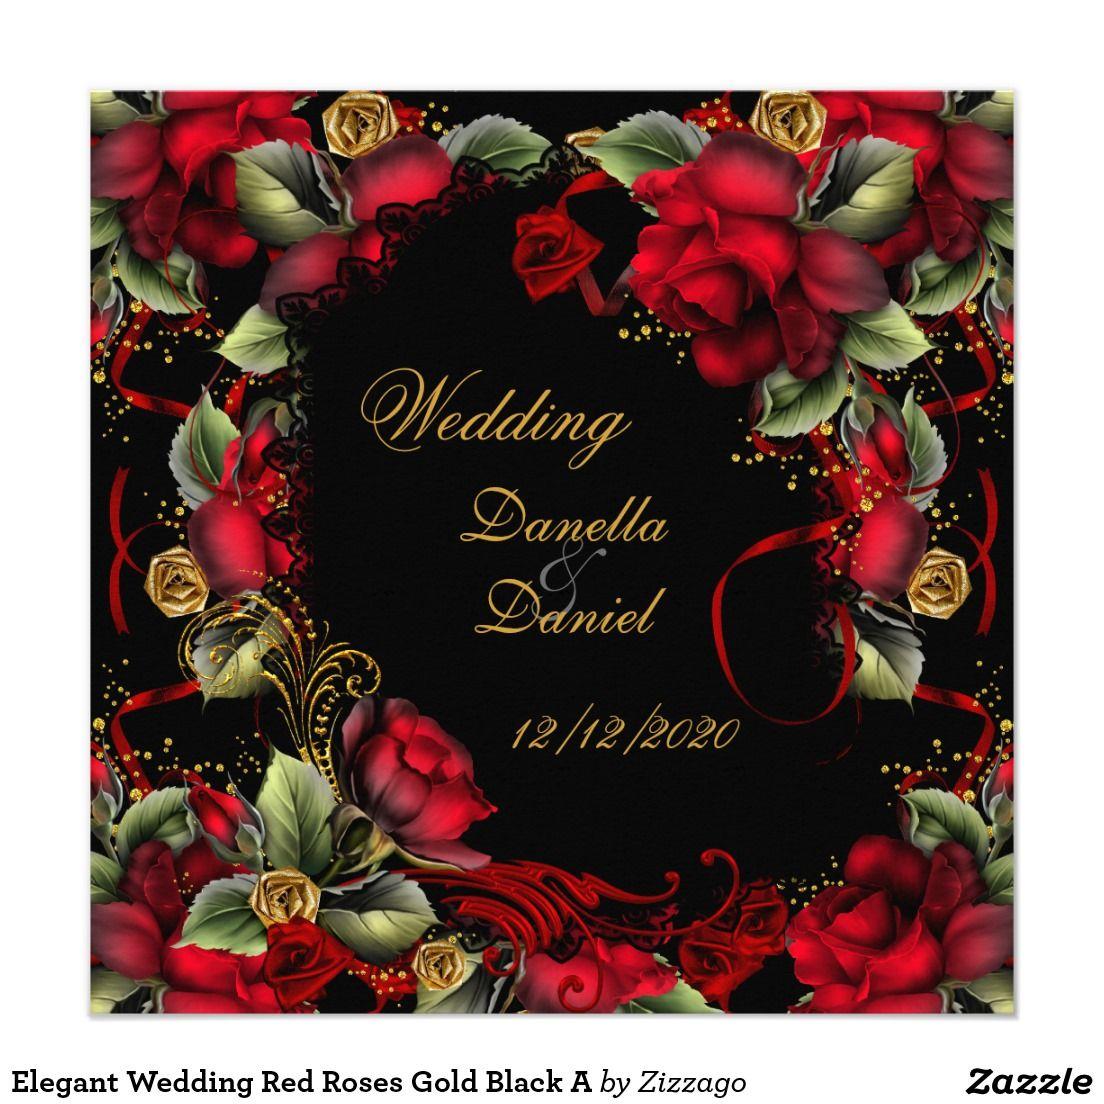 Elegant Wedding Red Roses Gold Black A Card | Elegant, Gold weddings ...